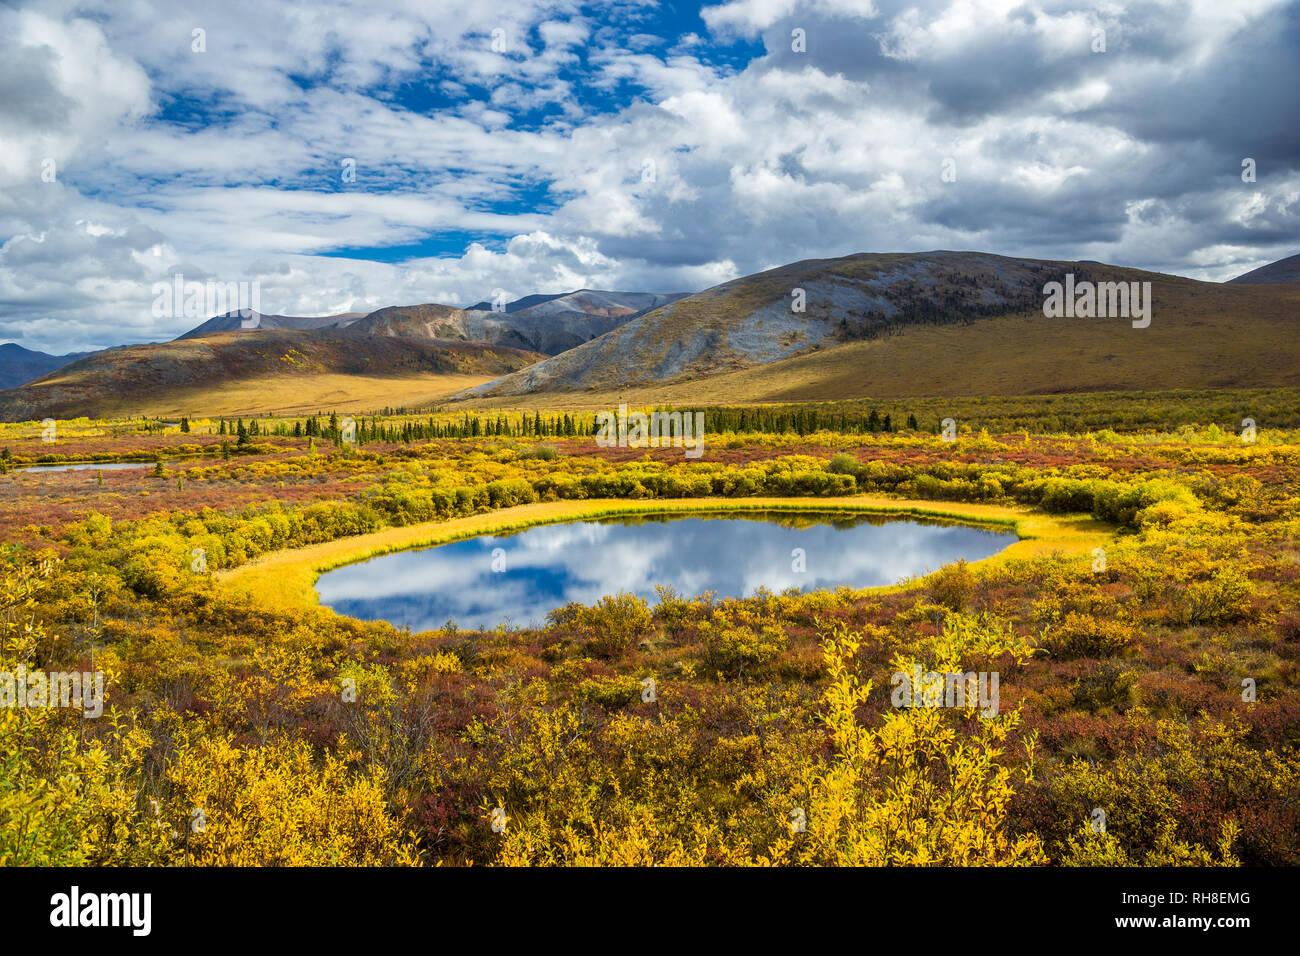 This wonderful Pond is taken in Tombstone Territorial Park, Yukon - Stock Image